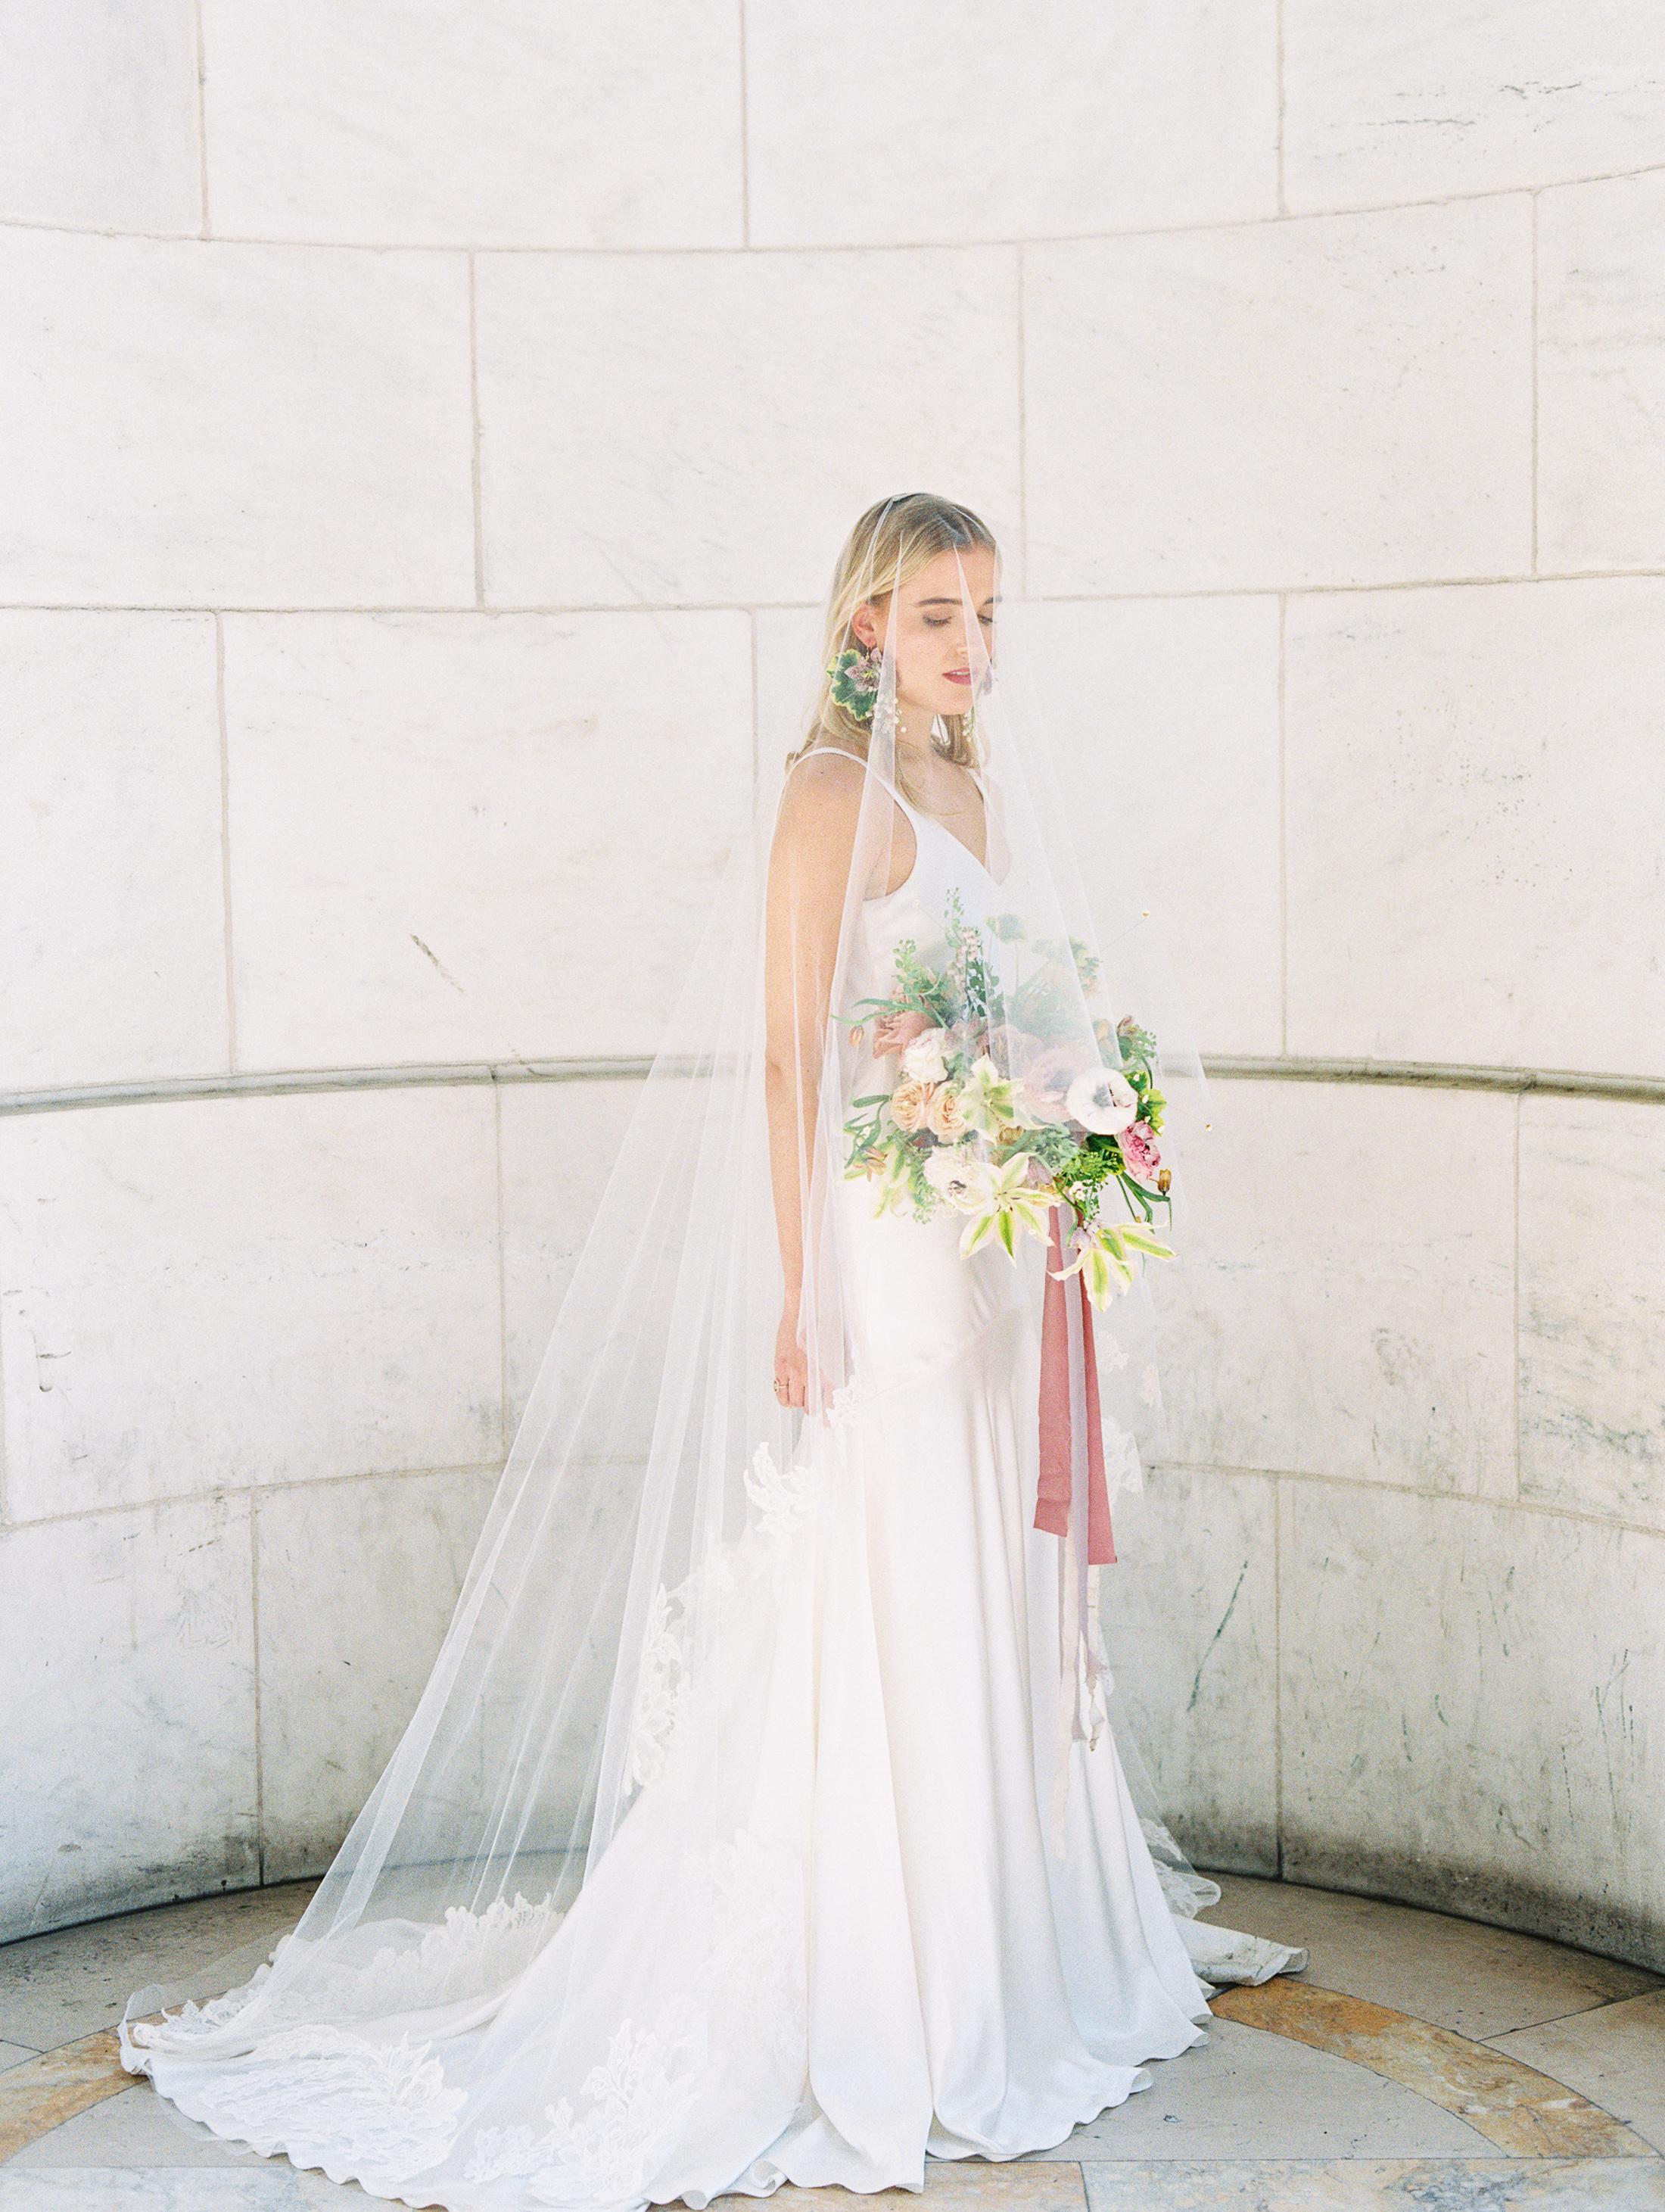 20180508-Pura-Soul-Photo-nyc-bridal--45.jpg